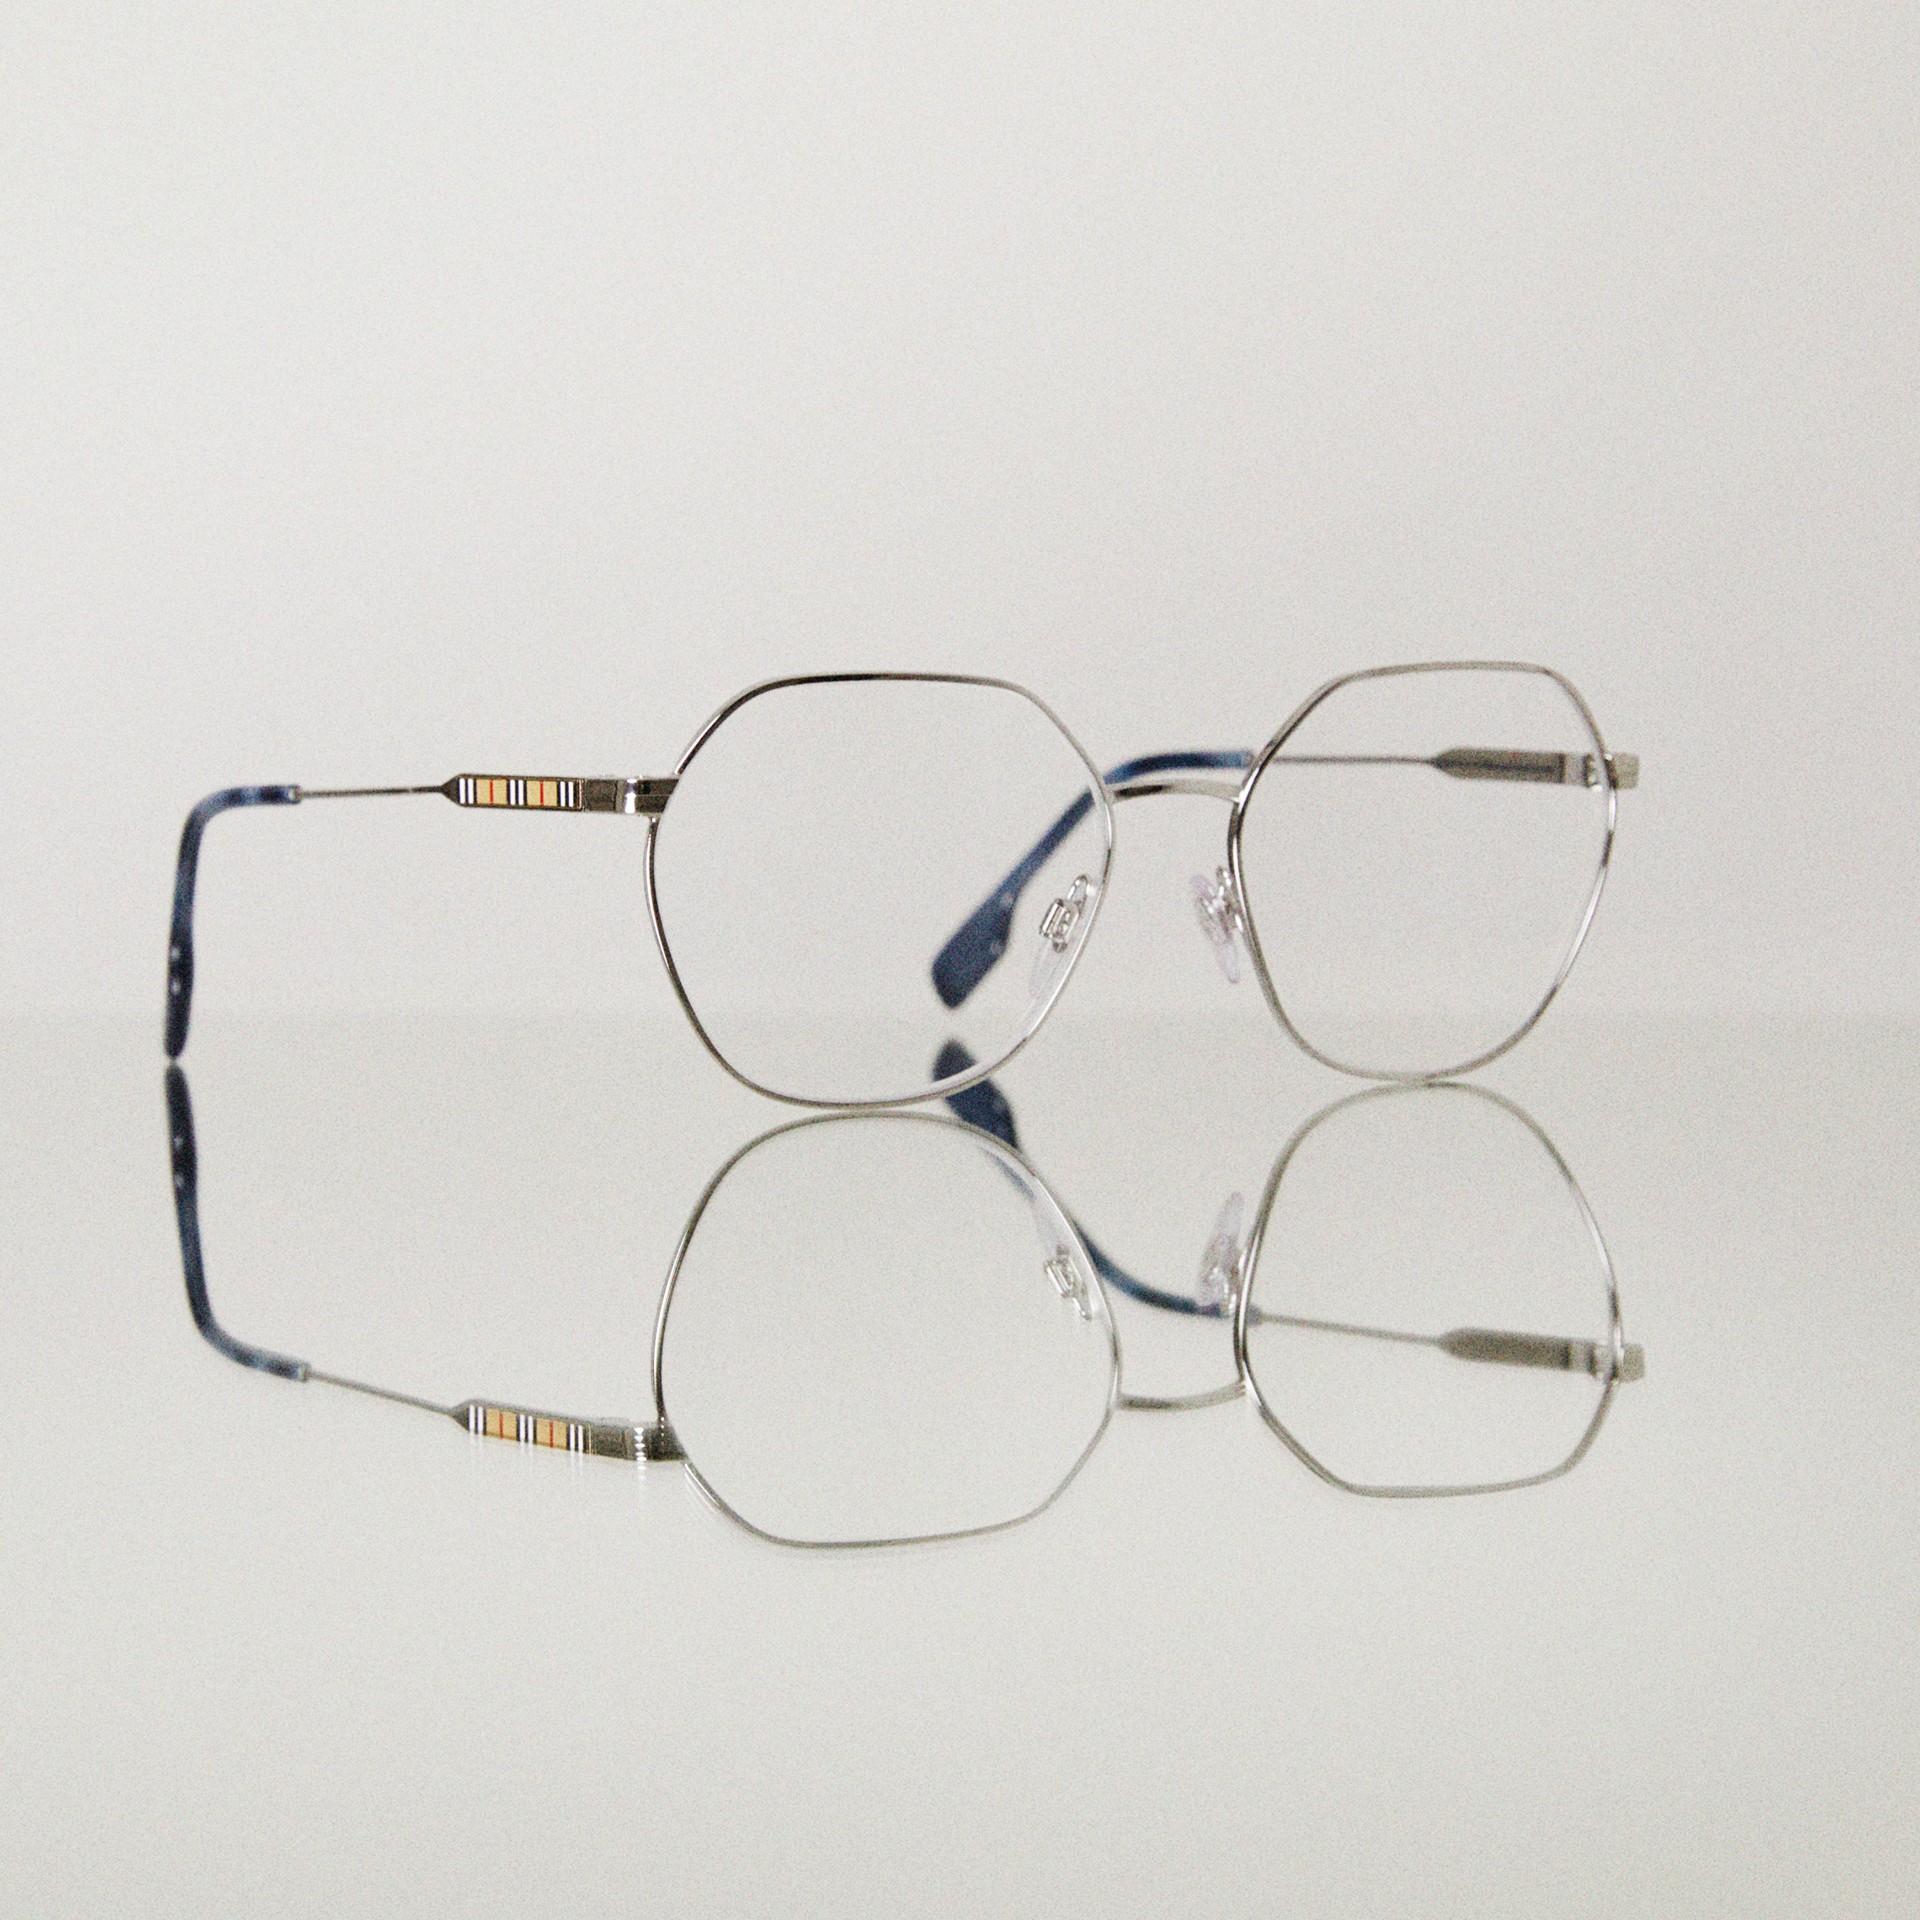 Geometric Optical Frames in Grey Tortoiseshell - Women | Burberry - gallery image 5